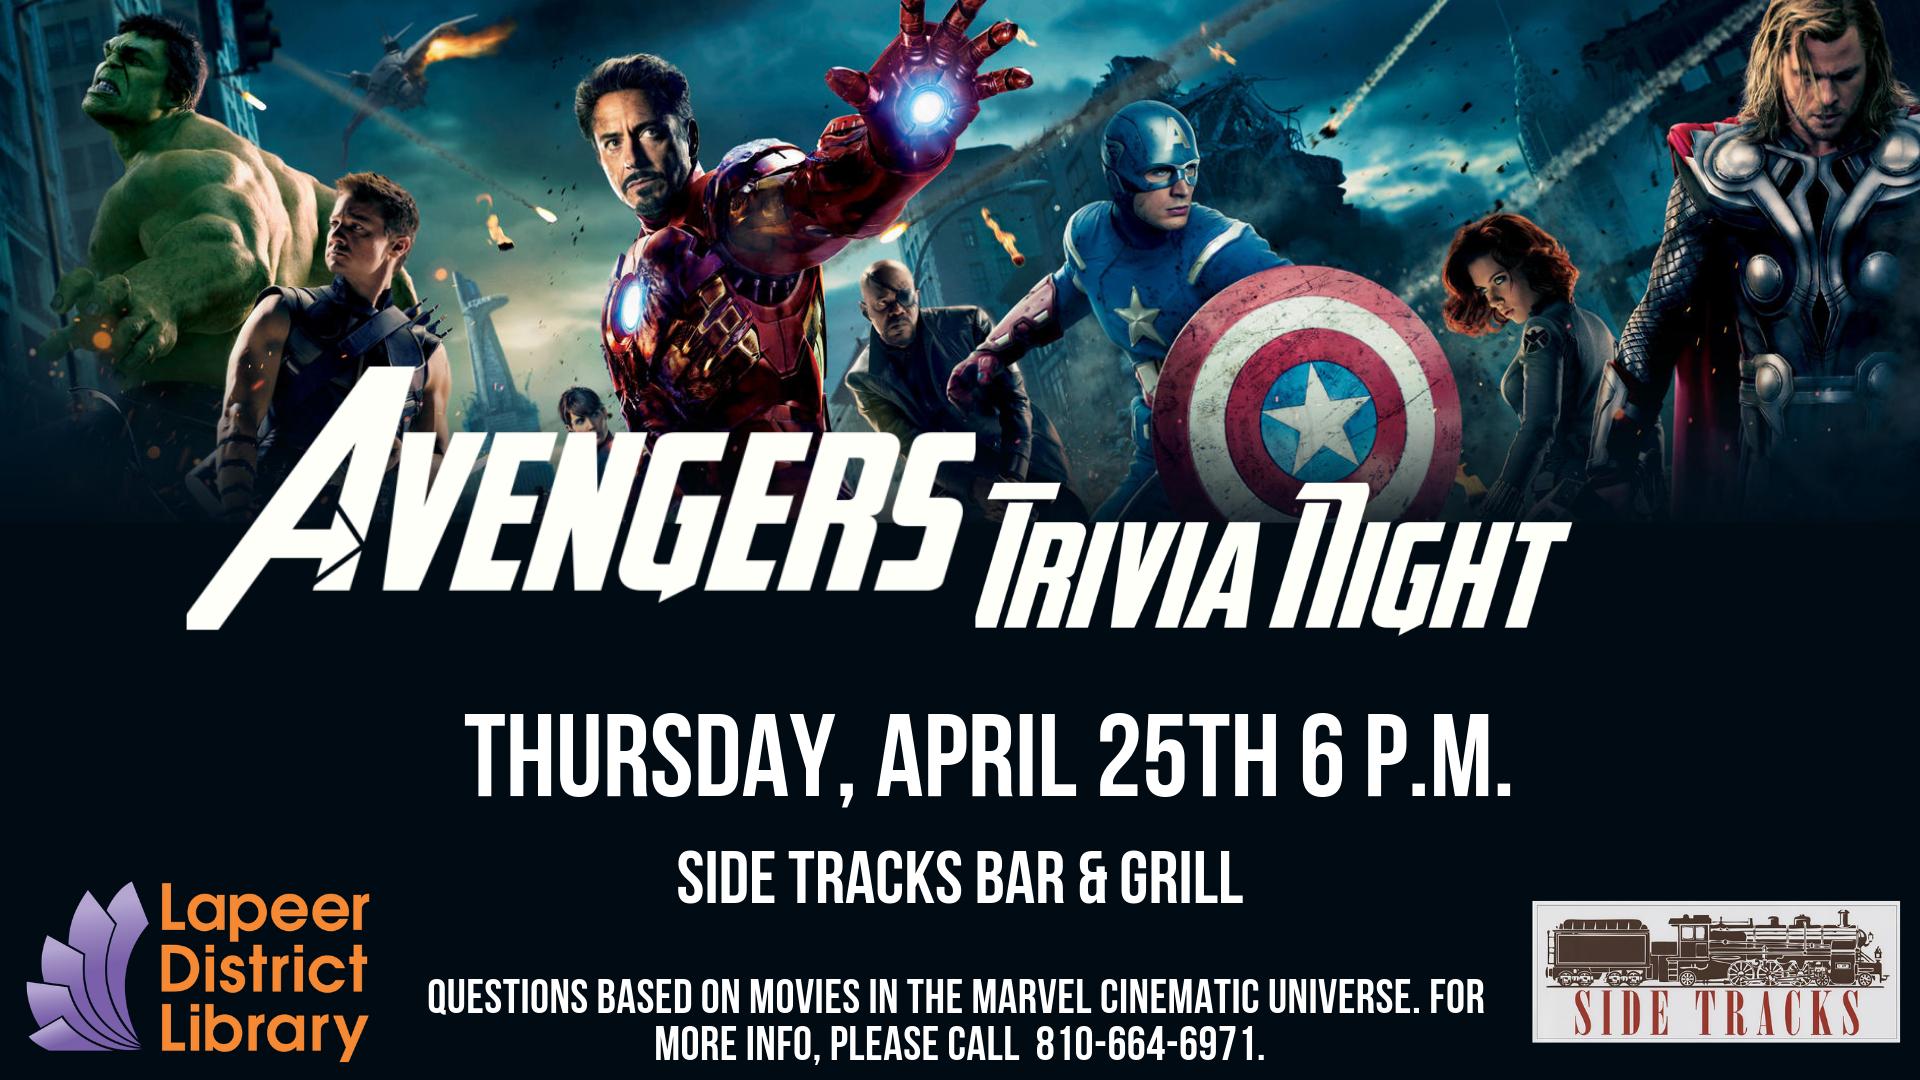 Trivia Night at Side Tracks Bar & Grill